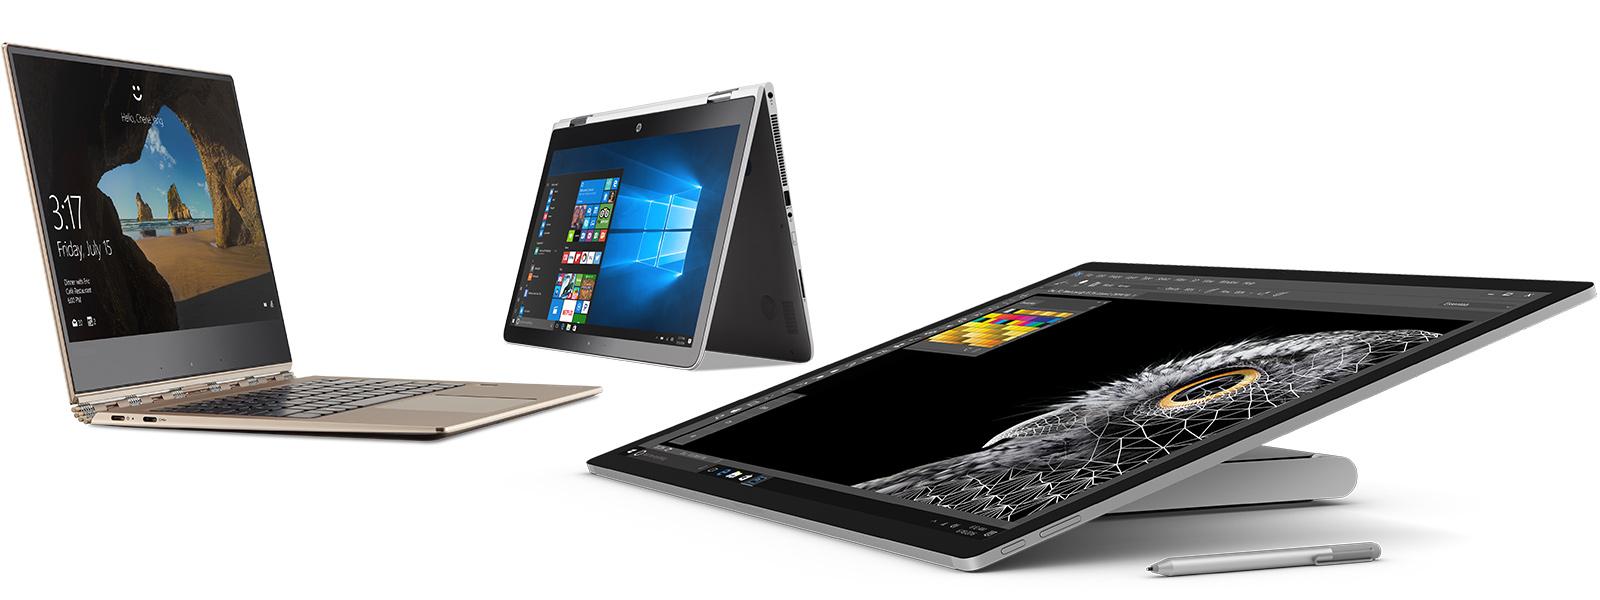 Groepsafbeelding HP Spectre, Lenovo Yoga en Surface Studio.